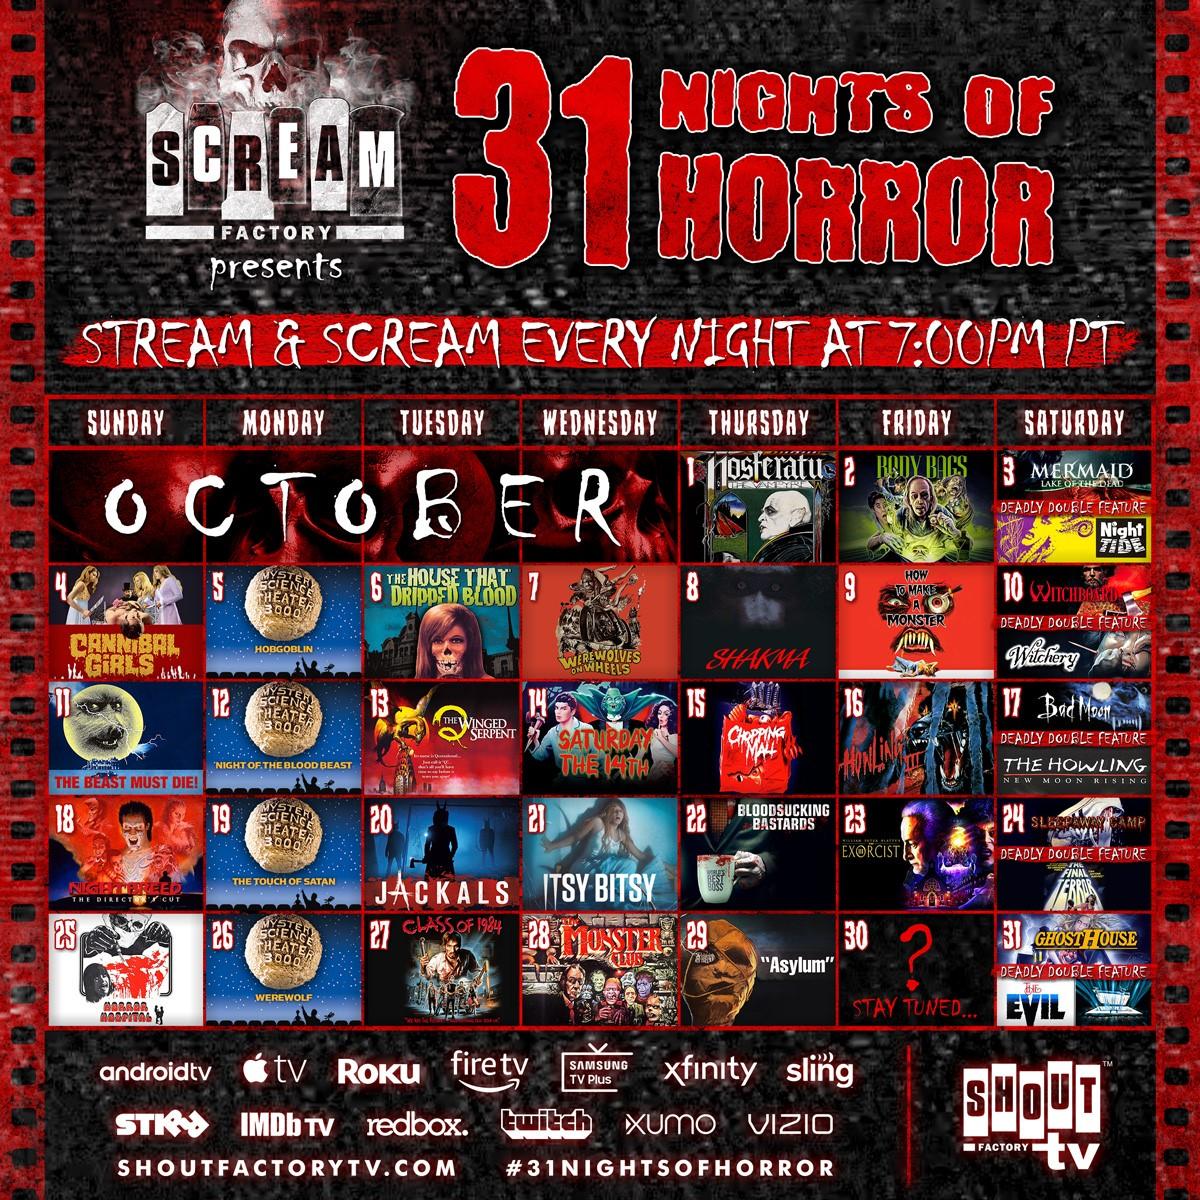 scream factory 31 nights of horror